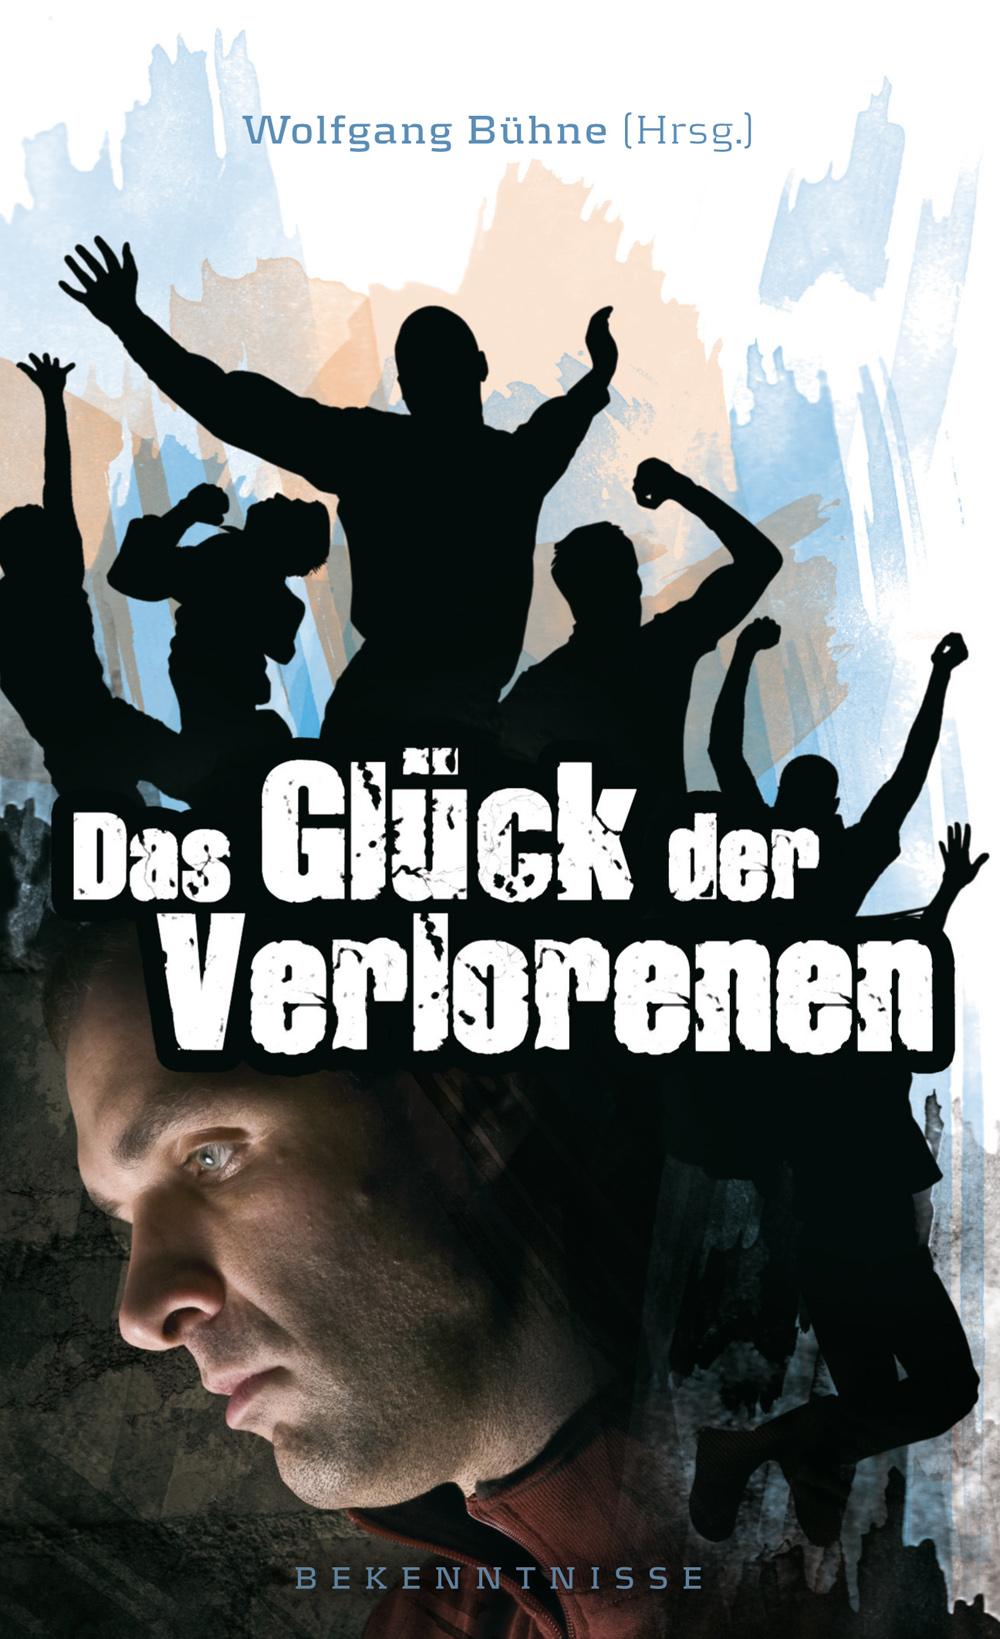 CLV_das-glueck-der-verlorenen_wolfgang-buehne_256131_1